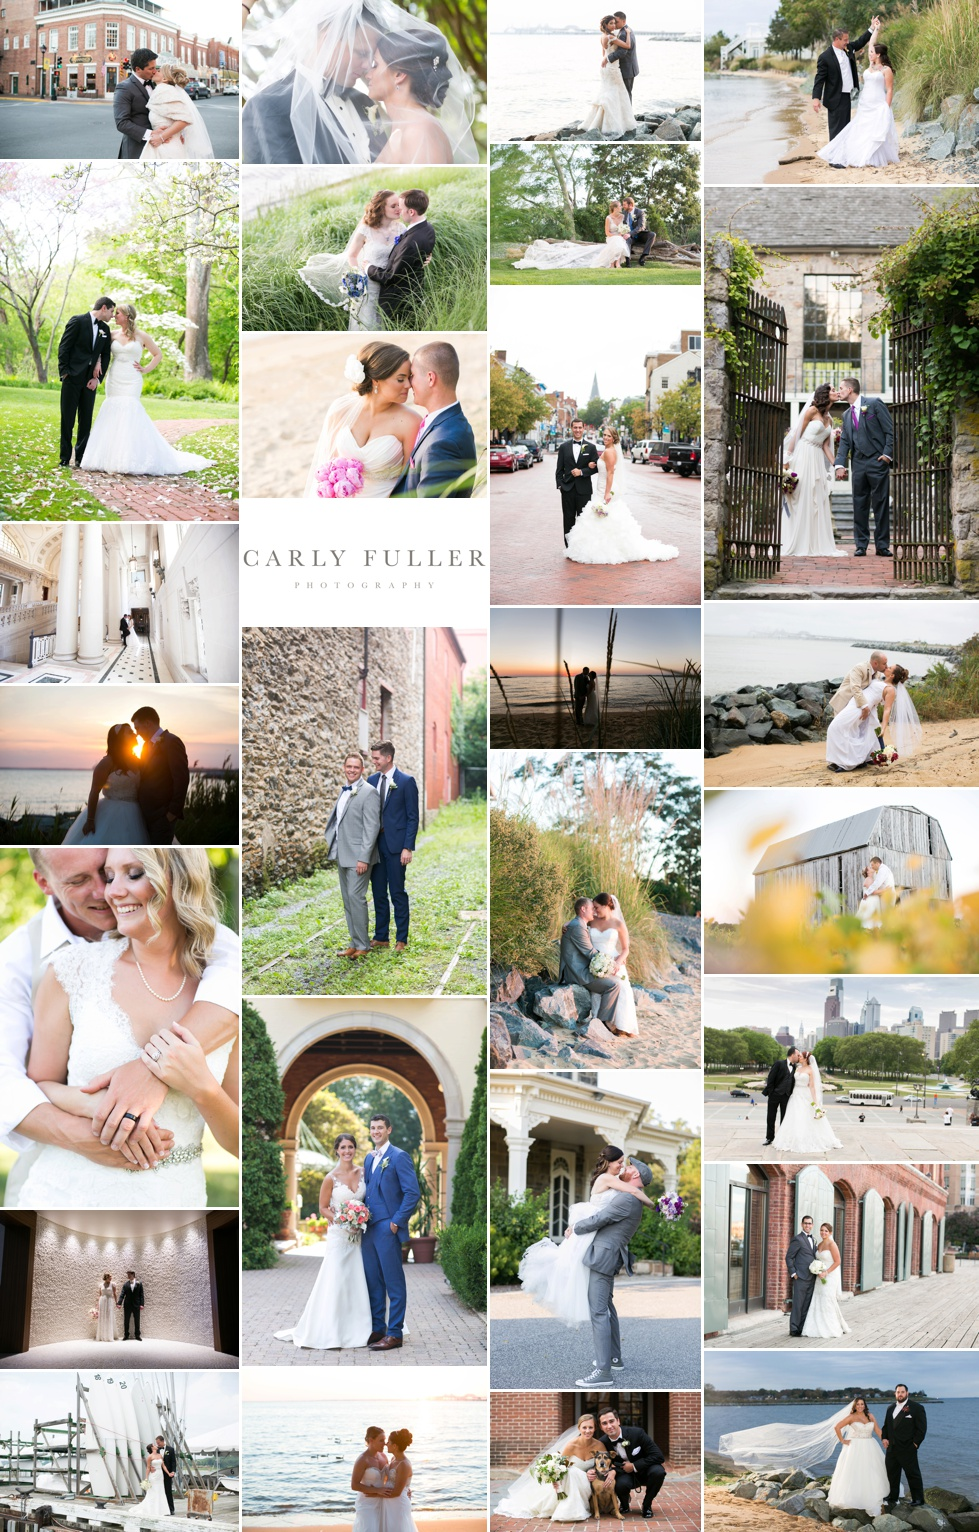 Favorite Wedding photographs of 2015 - Philadelphia wedding photographer